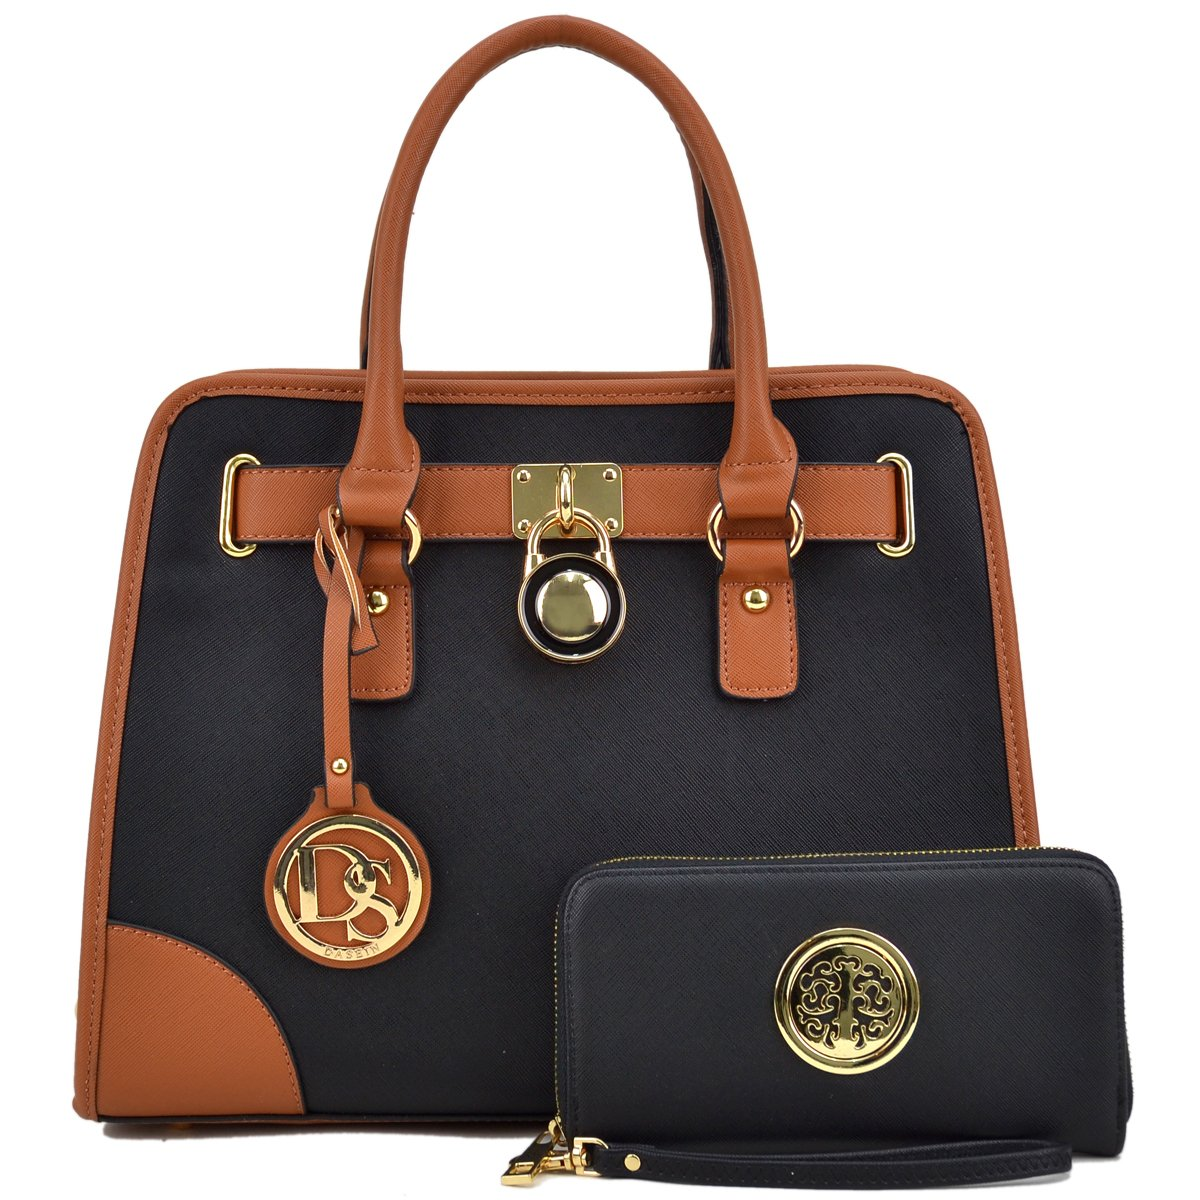 Women Designer Handbags and Purses Ladies Satchel Bags Shoulder Bags Top  Handle Bags w Matching Wallet  Handbags  Amazon.com 1f0e45109dcc3